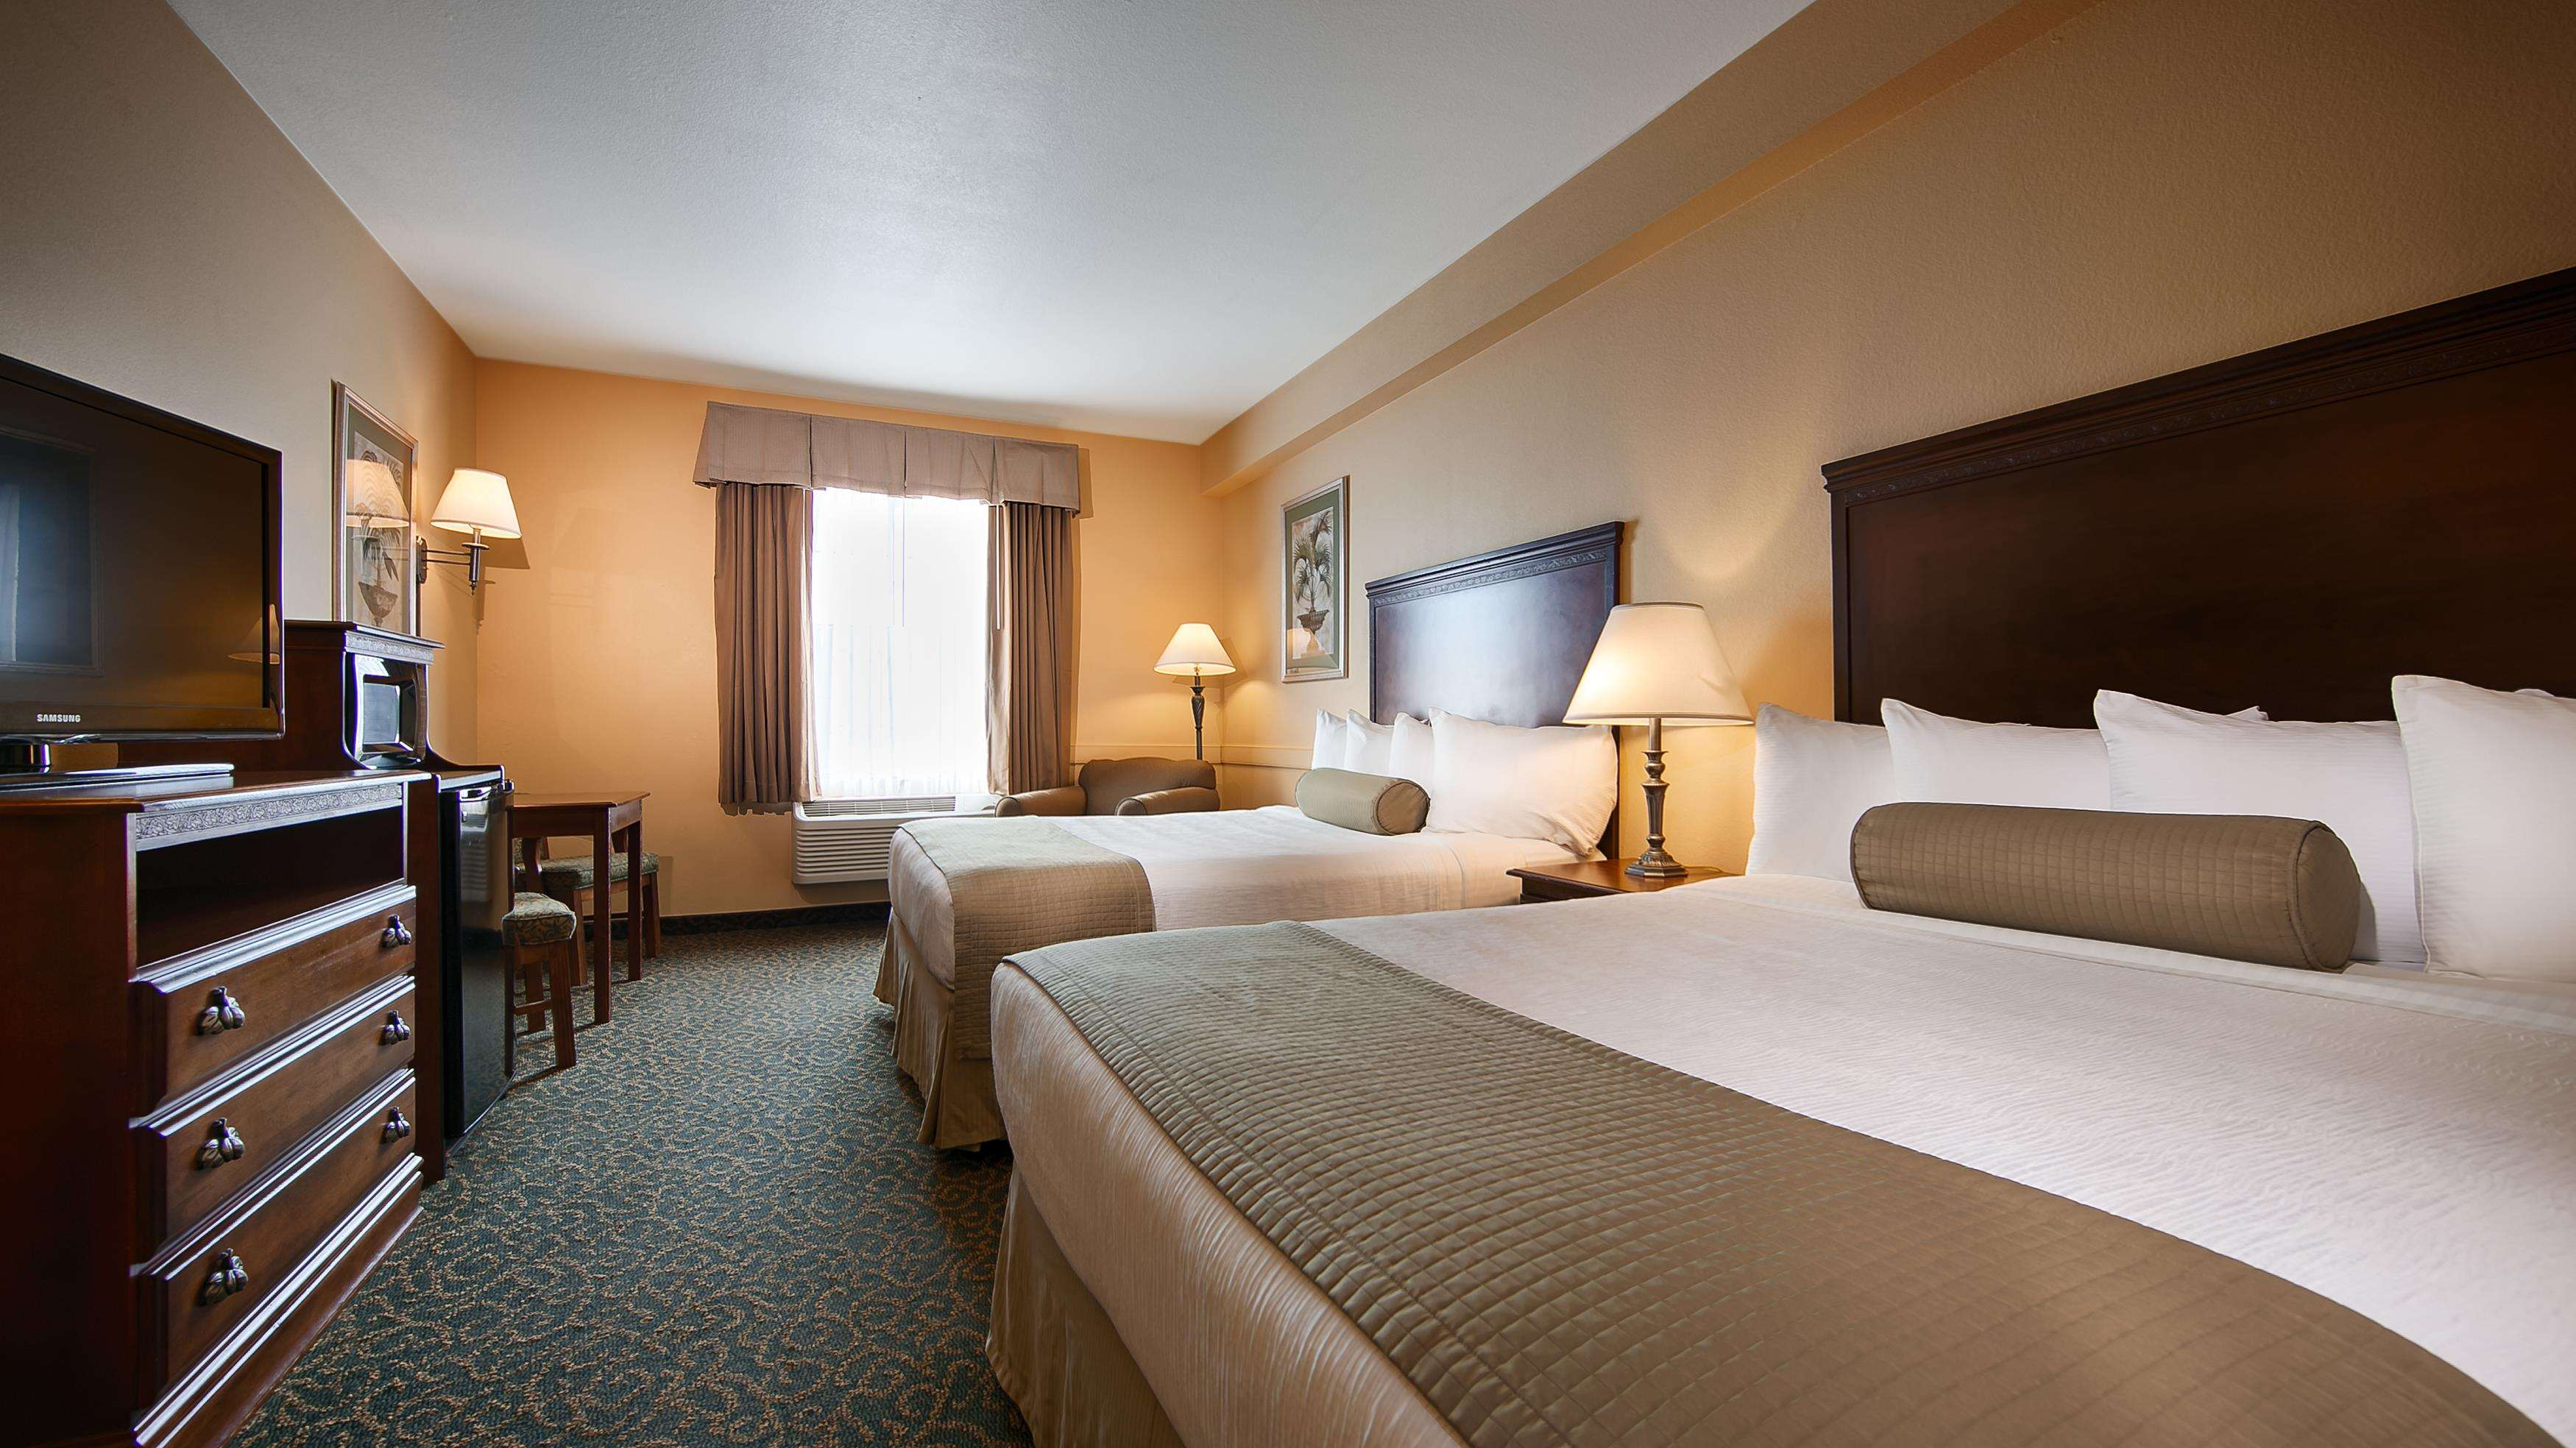 Best Western Plus Executive Hotel & Suites image 16